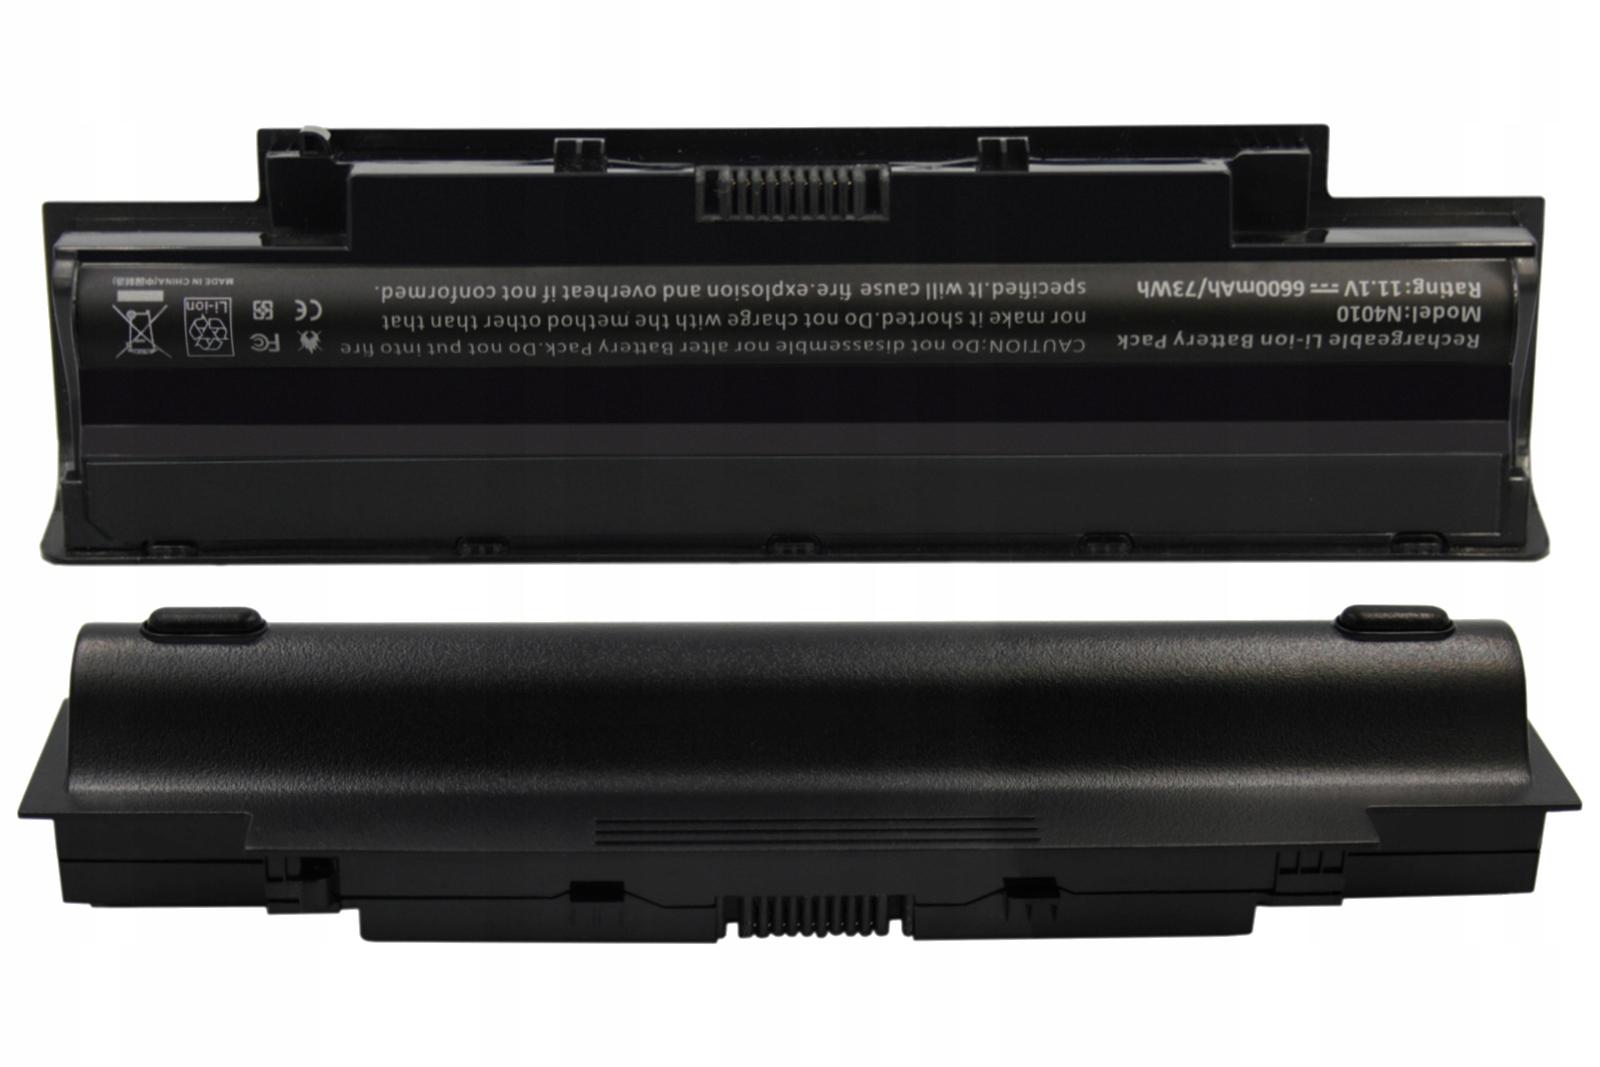 BATERIA AKUMULATOR DELL N5010 N5030 N5050 N5110 N7110 J1KND - Baterie do laptopów